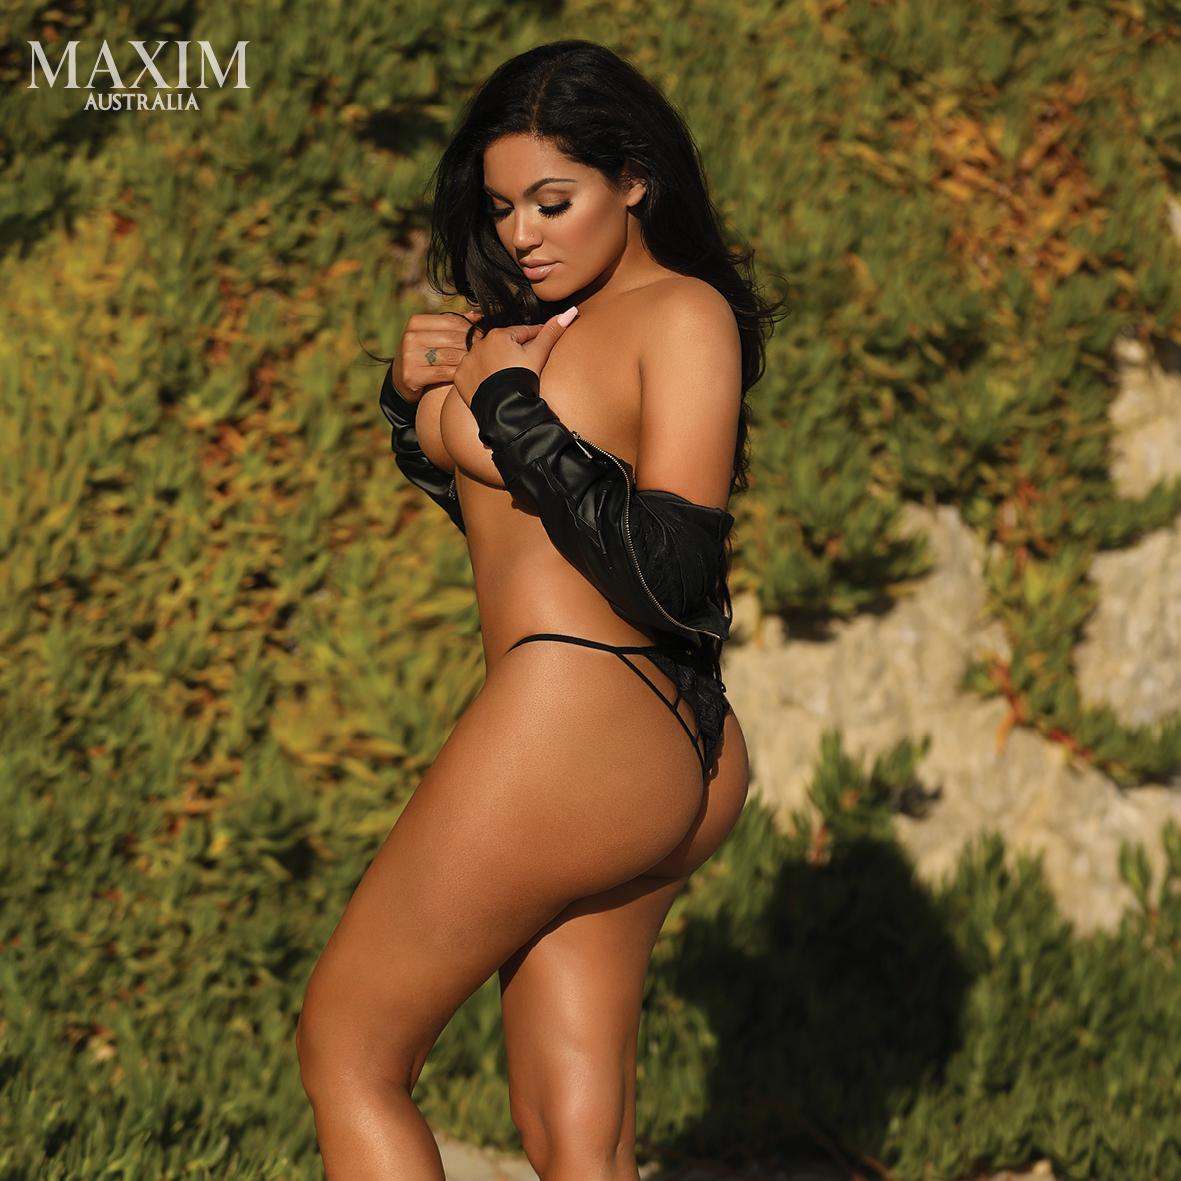 Maxim-Australia-Eliana-Brasil-7